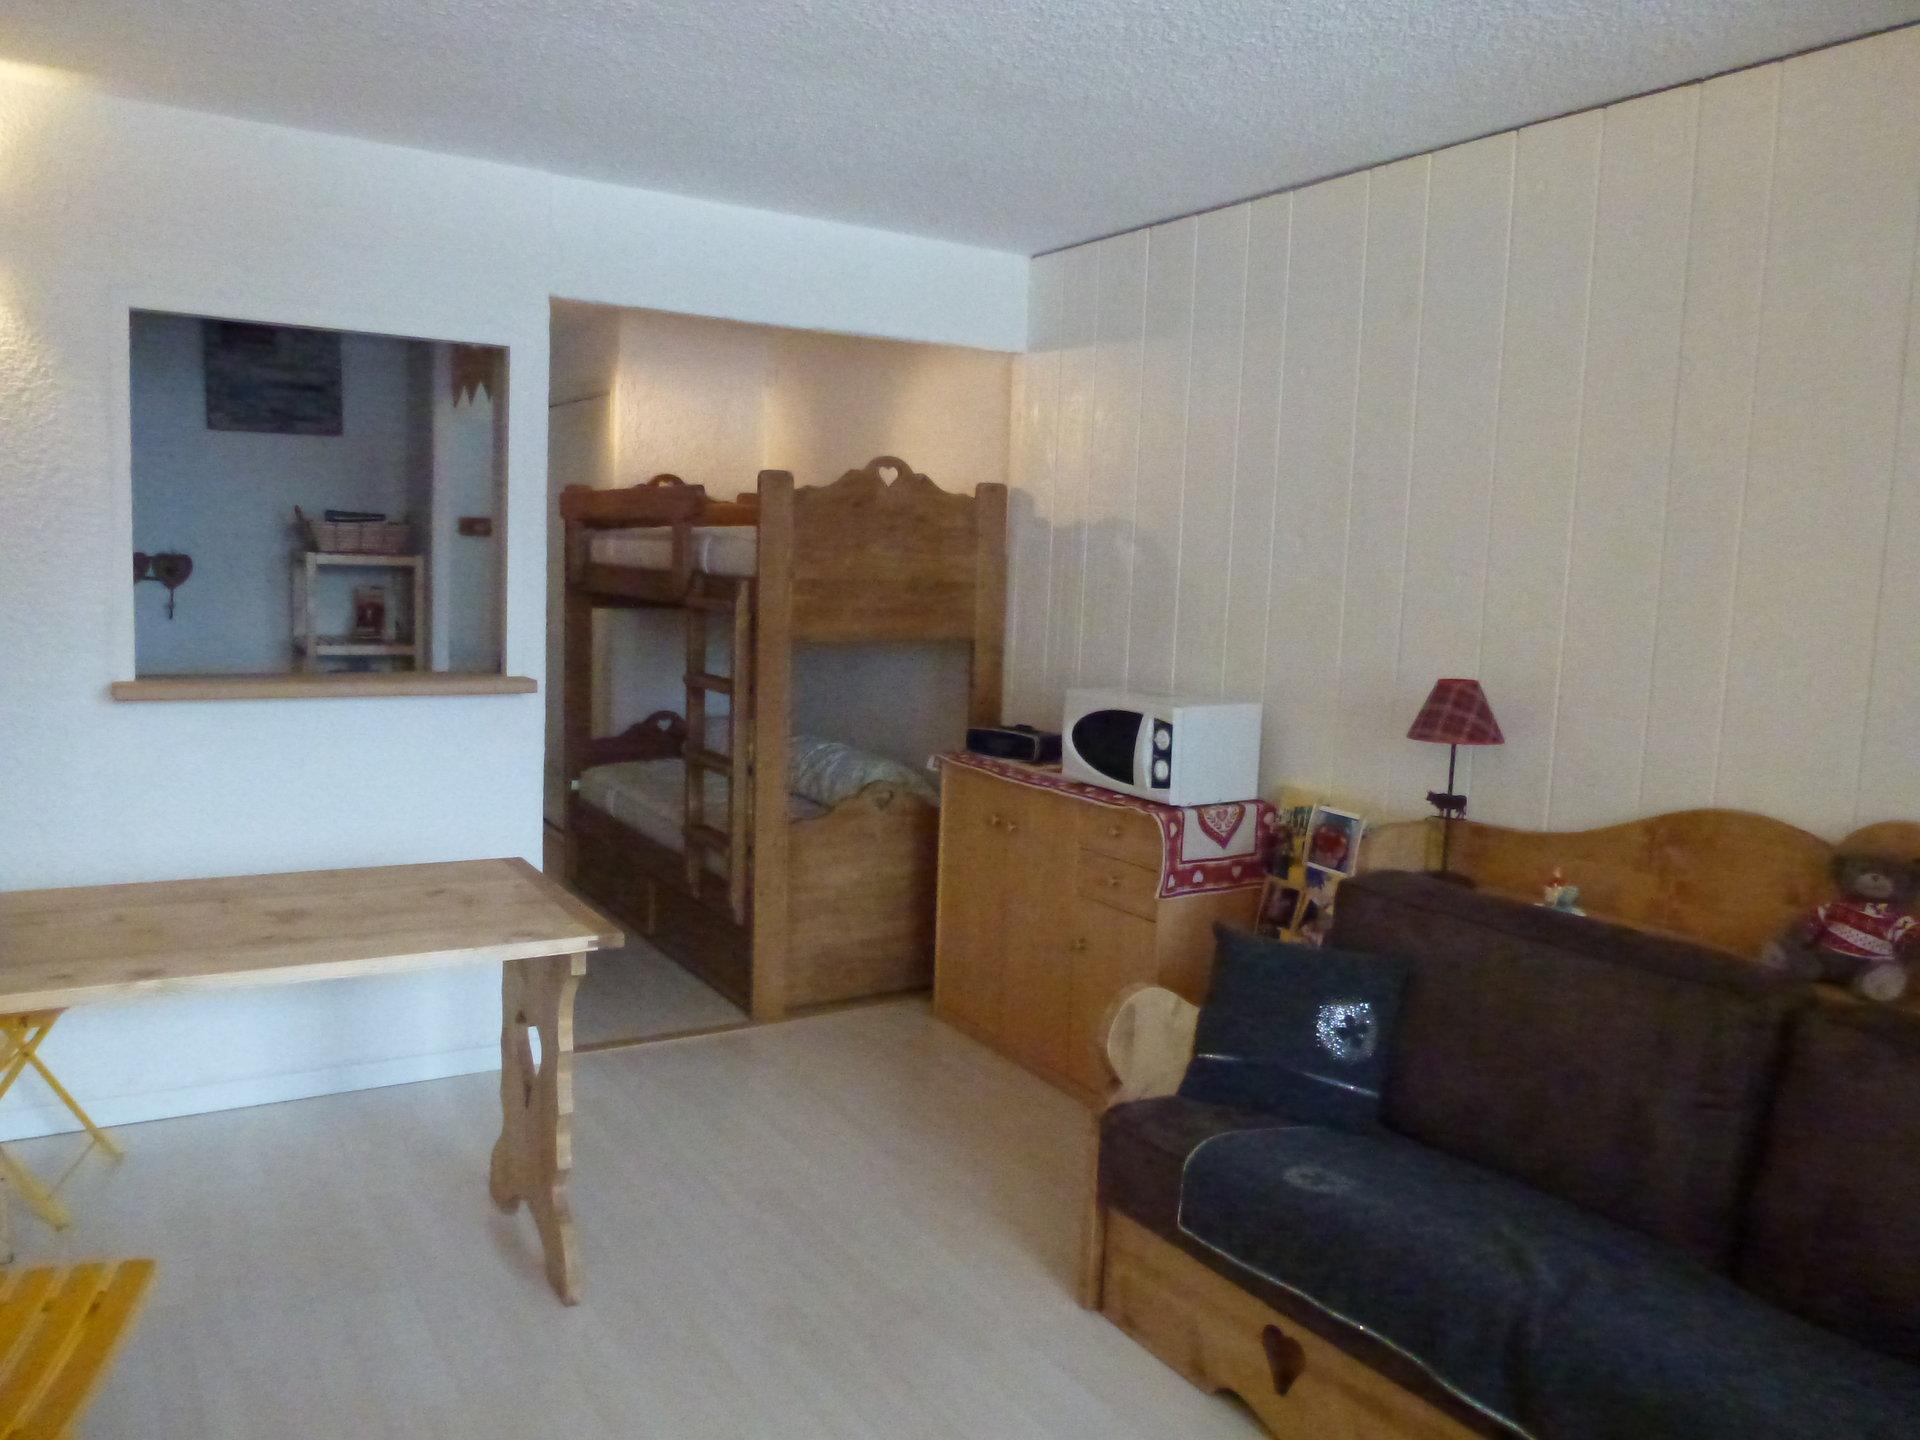 Seasonal rental Apartment - Isola 2000